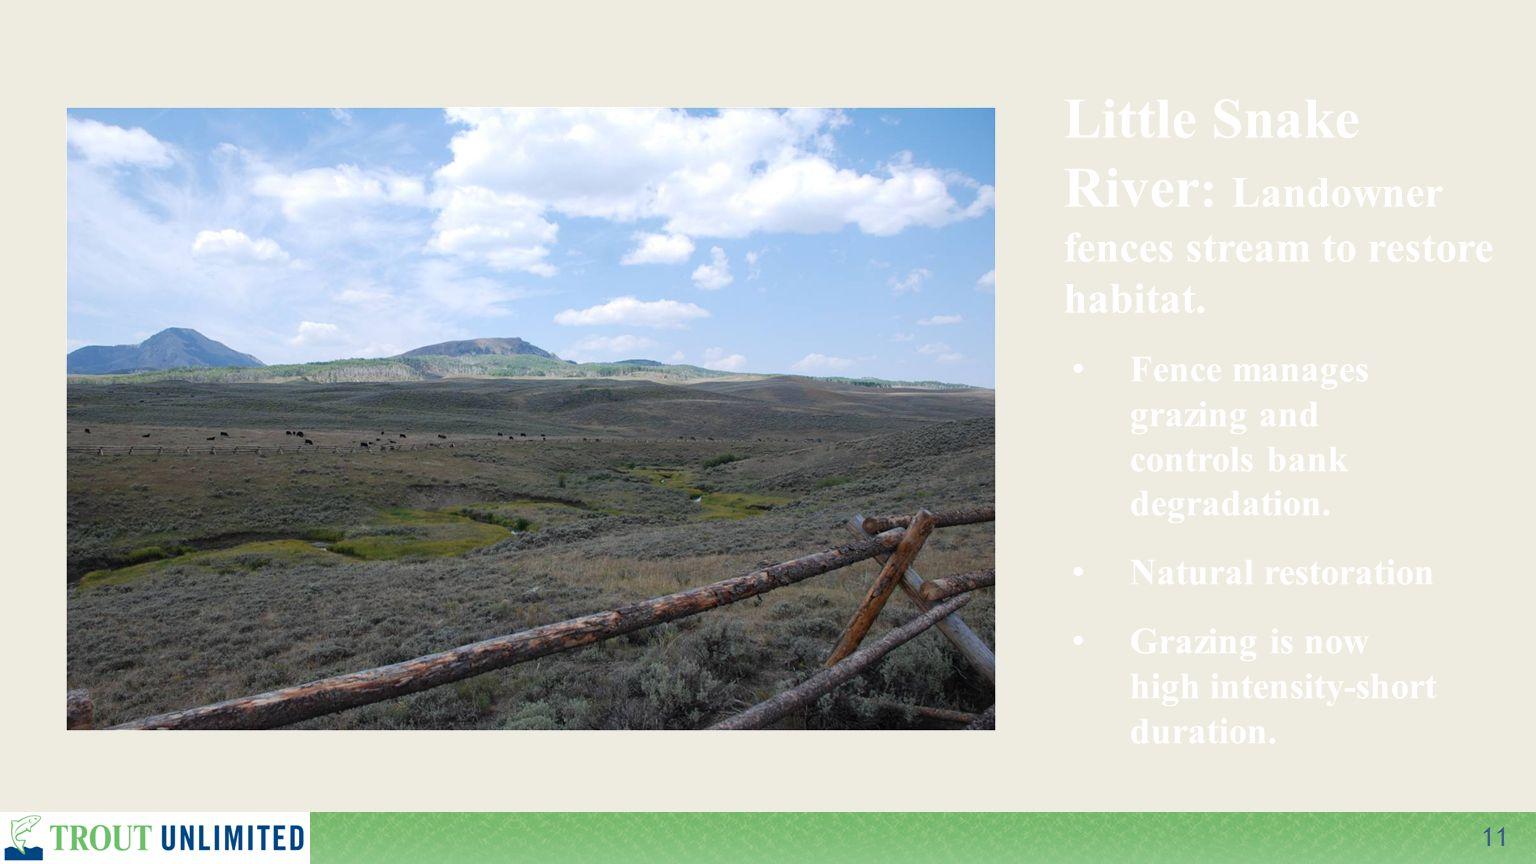 11 Little Snake River : Landowner fences stream to restore habitat. Fence manages grazing and controls bank degradation. Natural restoration Grazing i